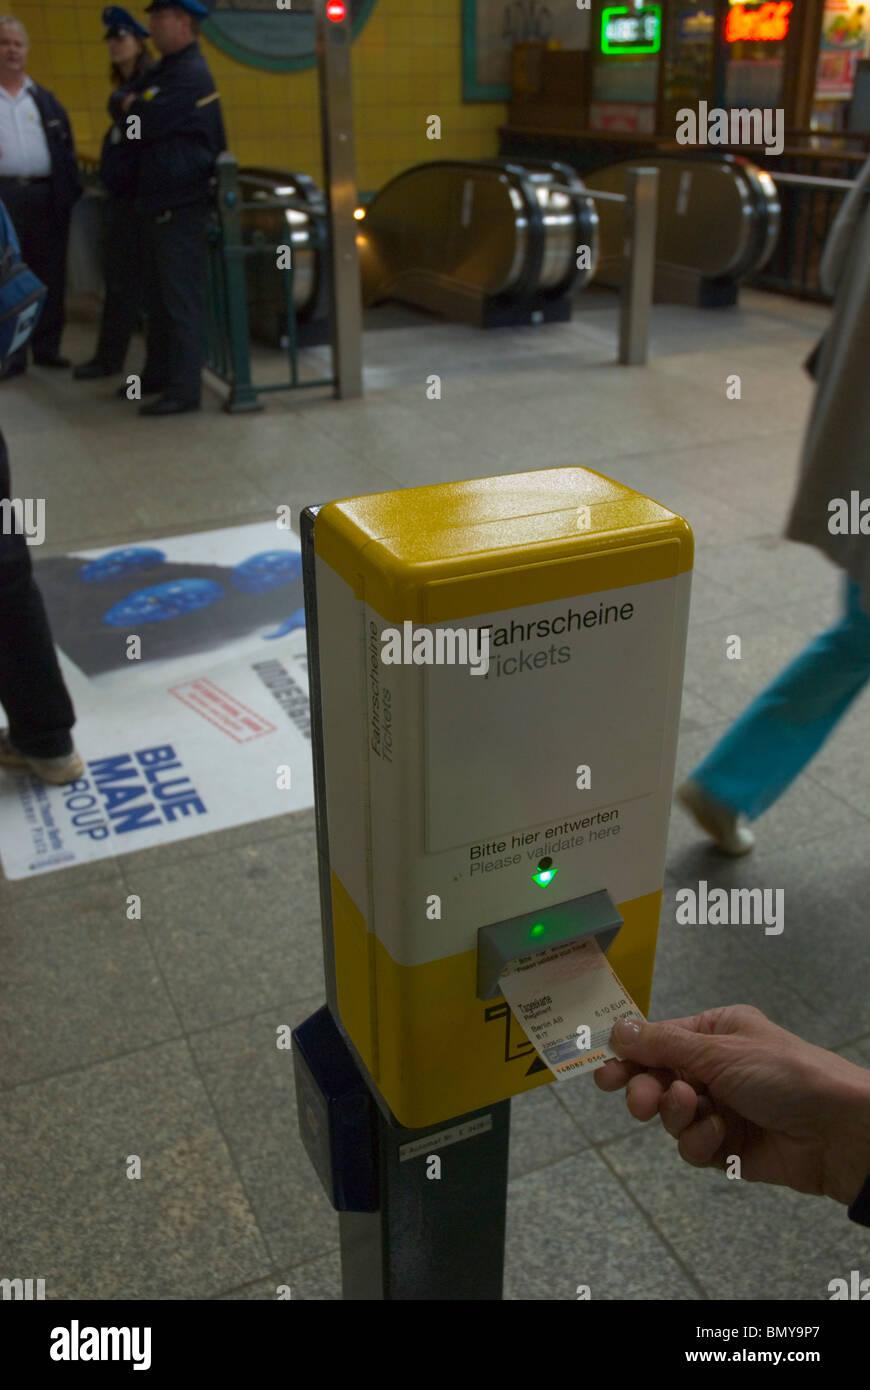 Person validating her ticket at Winterbergplatz metro station west Berlin Germany Europe - Stock Image